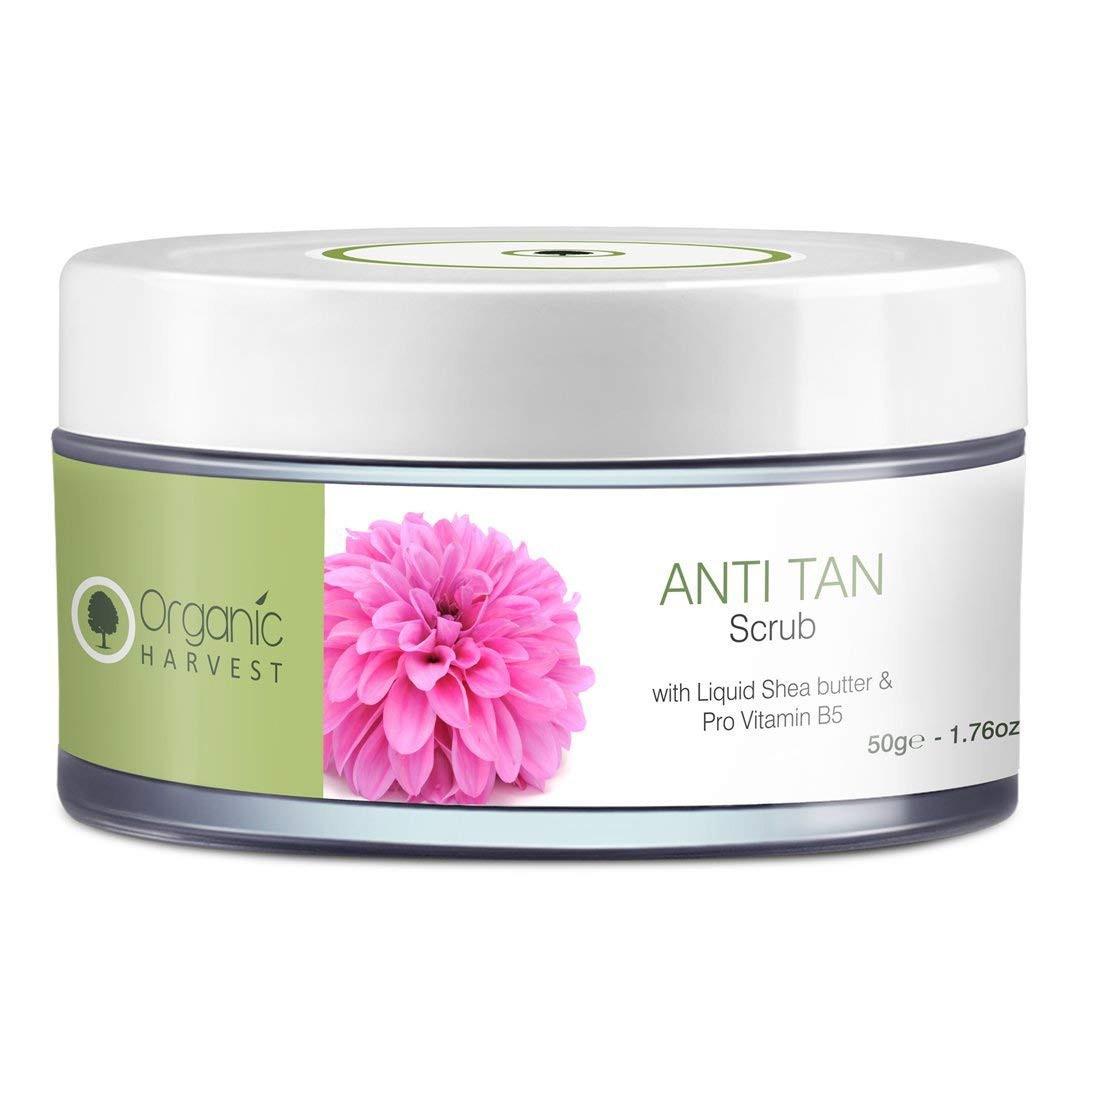 Organic Harvest Anti Tan Scrub 50g